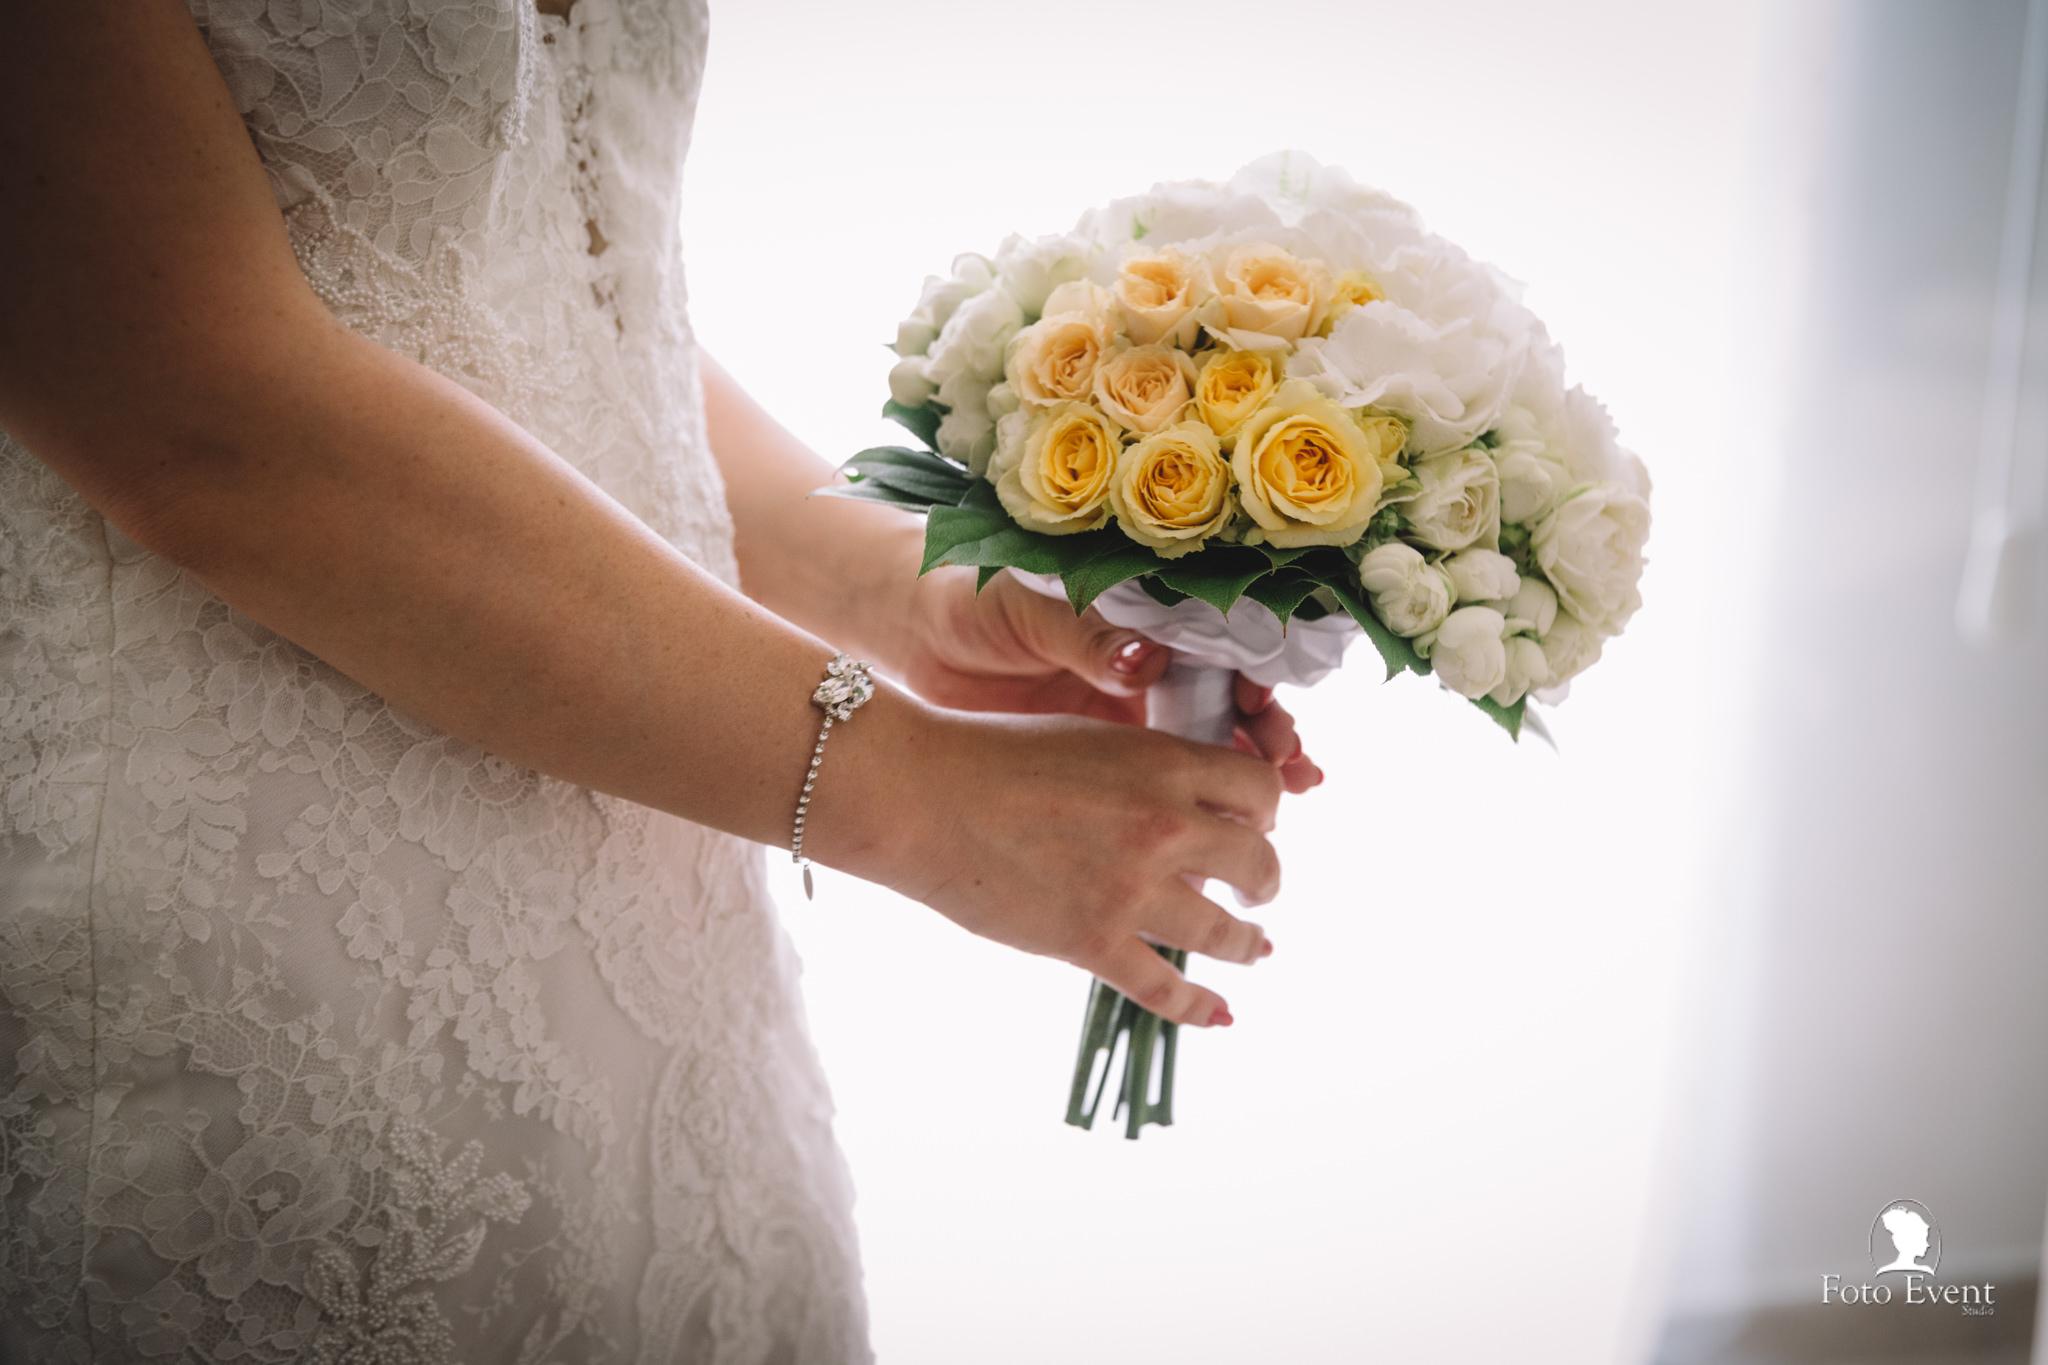 013-2019-06-12-Matrimonio-Rosa-e-Angelo-Ripellino-5DE-654